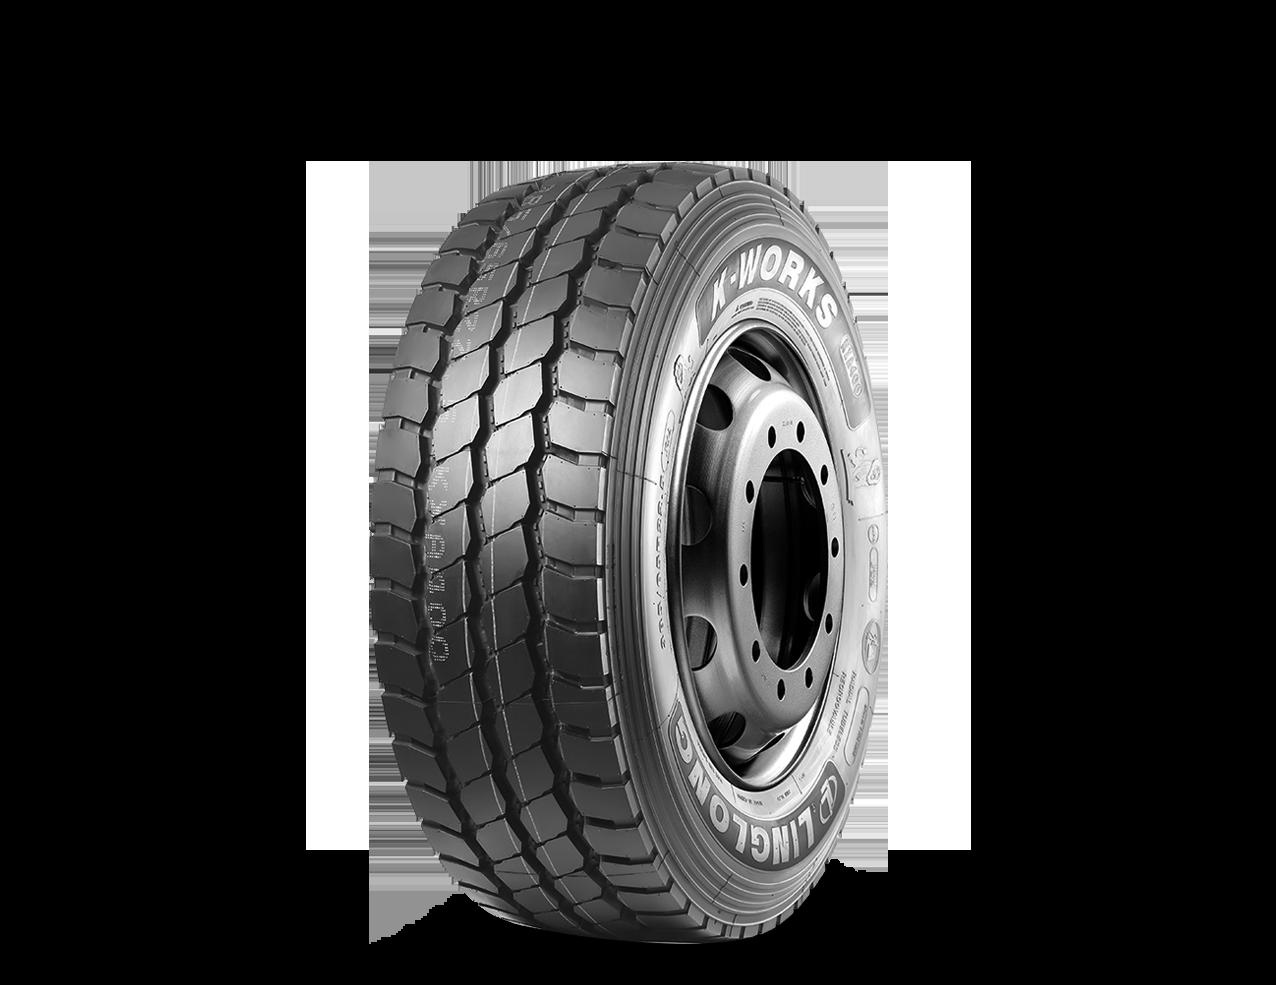 425/65R22.5 LINGLONG KXA400 165K TL M+S